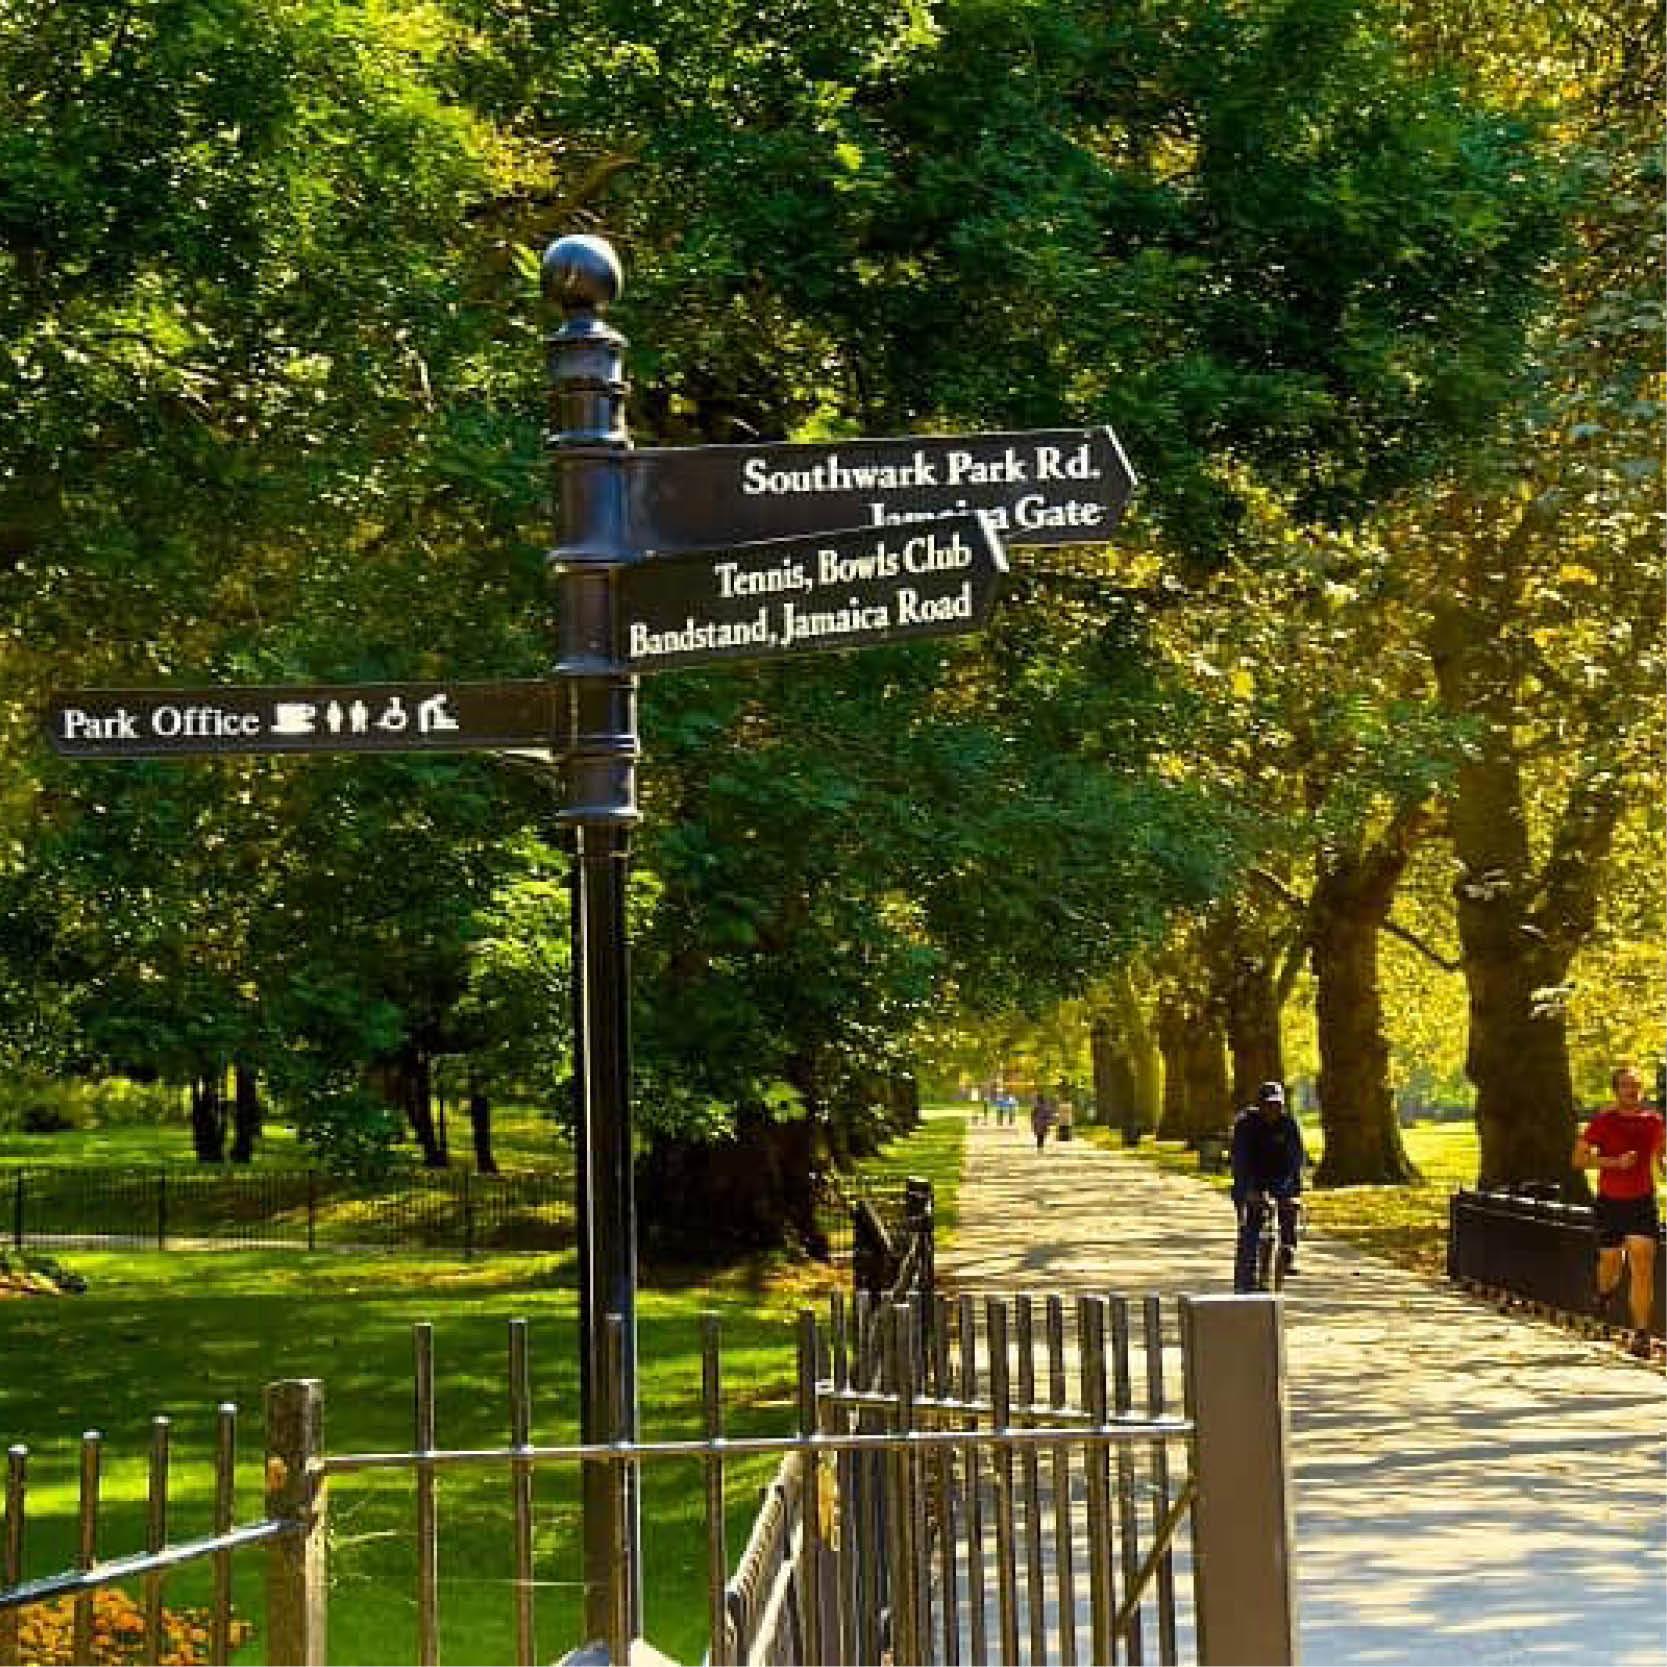 Way of Life - Vida House - Southwark Park